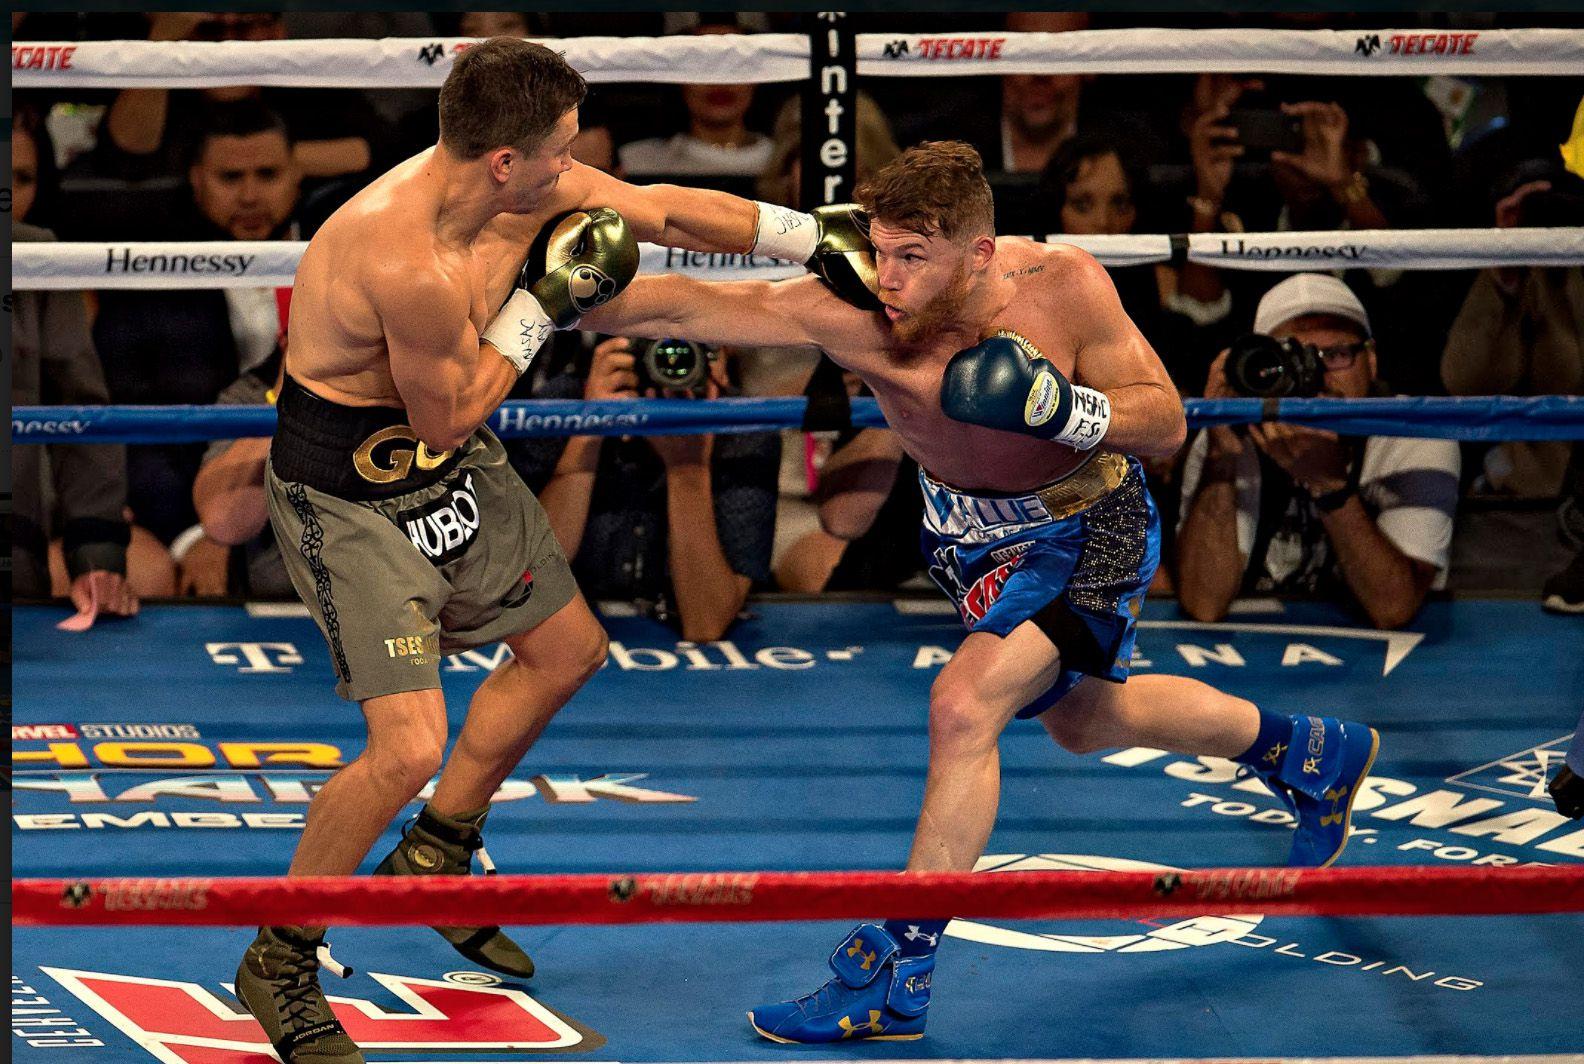 Gennady Golovkin y Saúl Àlvarez se enfrentaron el sábado 16 en Vegas. Foto AL DÍA